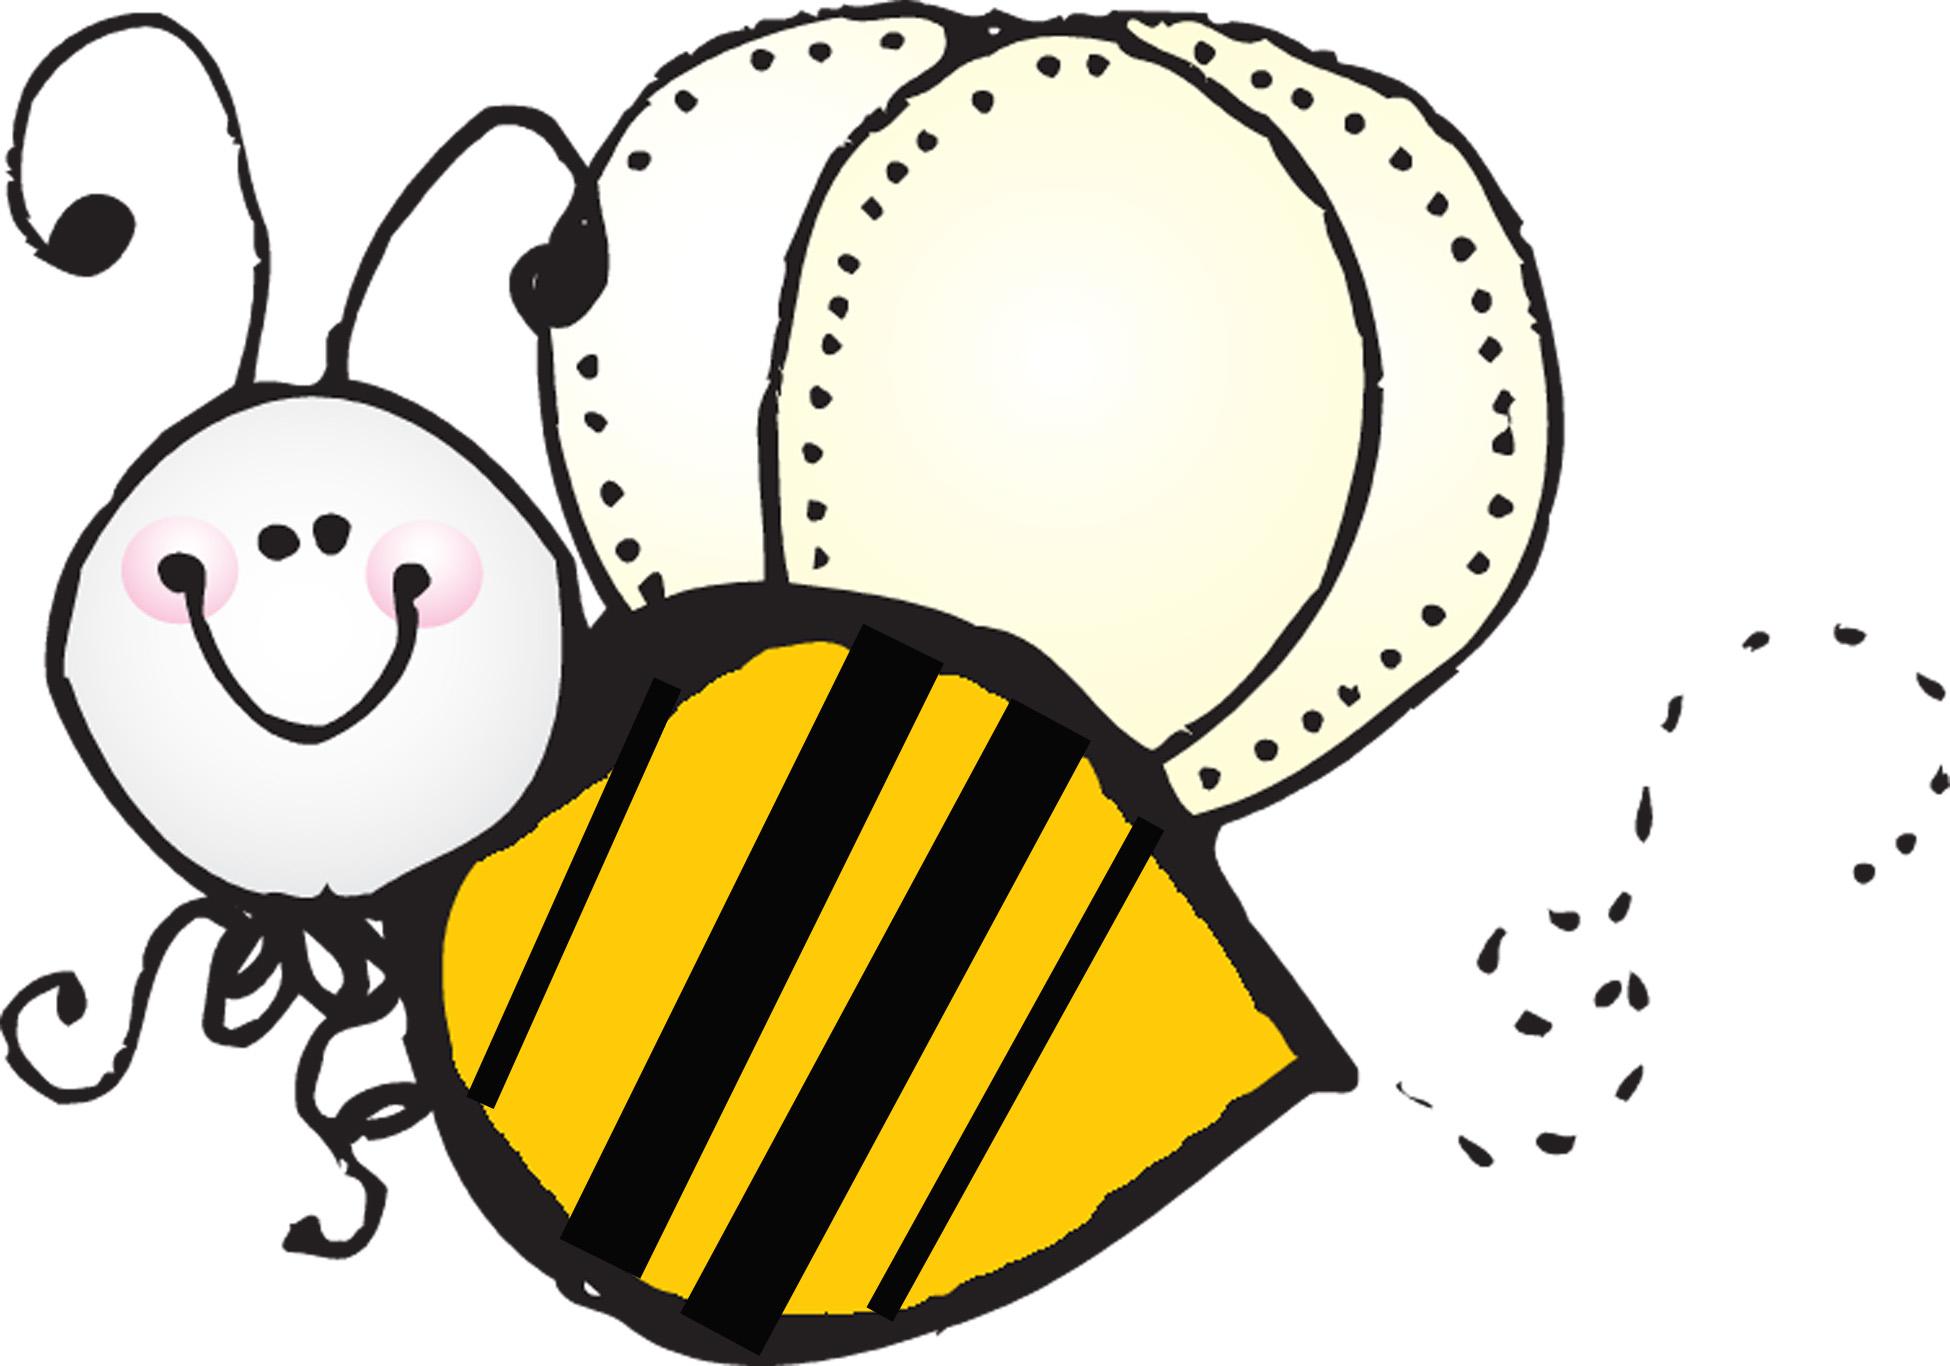 1950x1366 Bee Clip Art